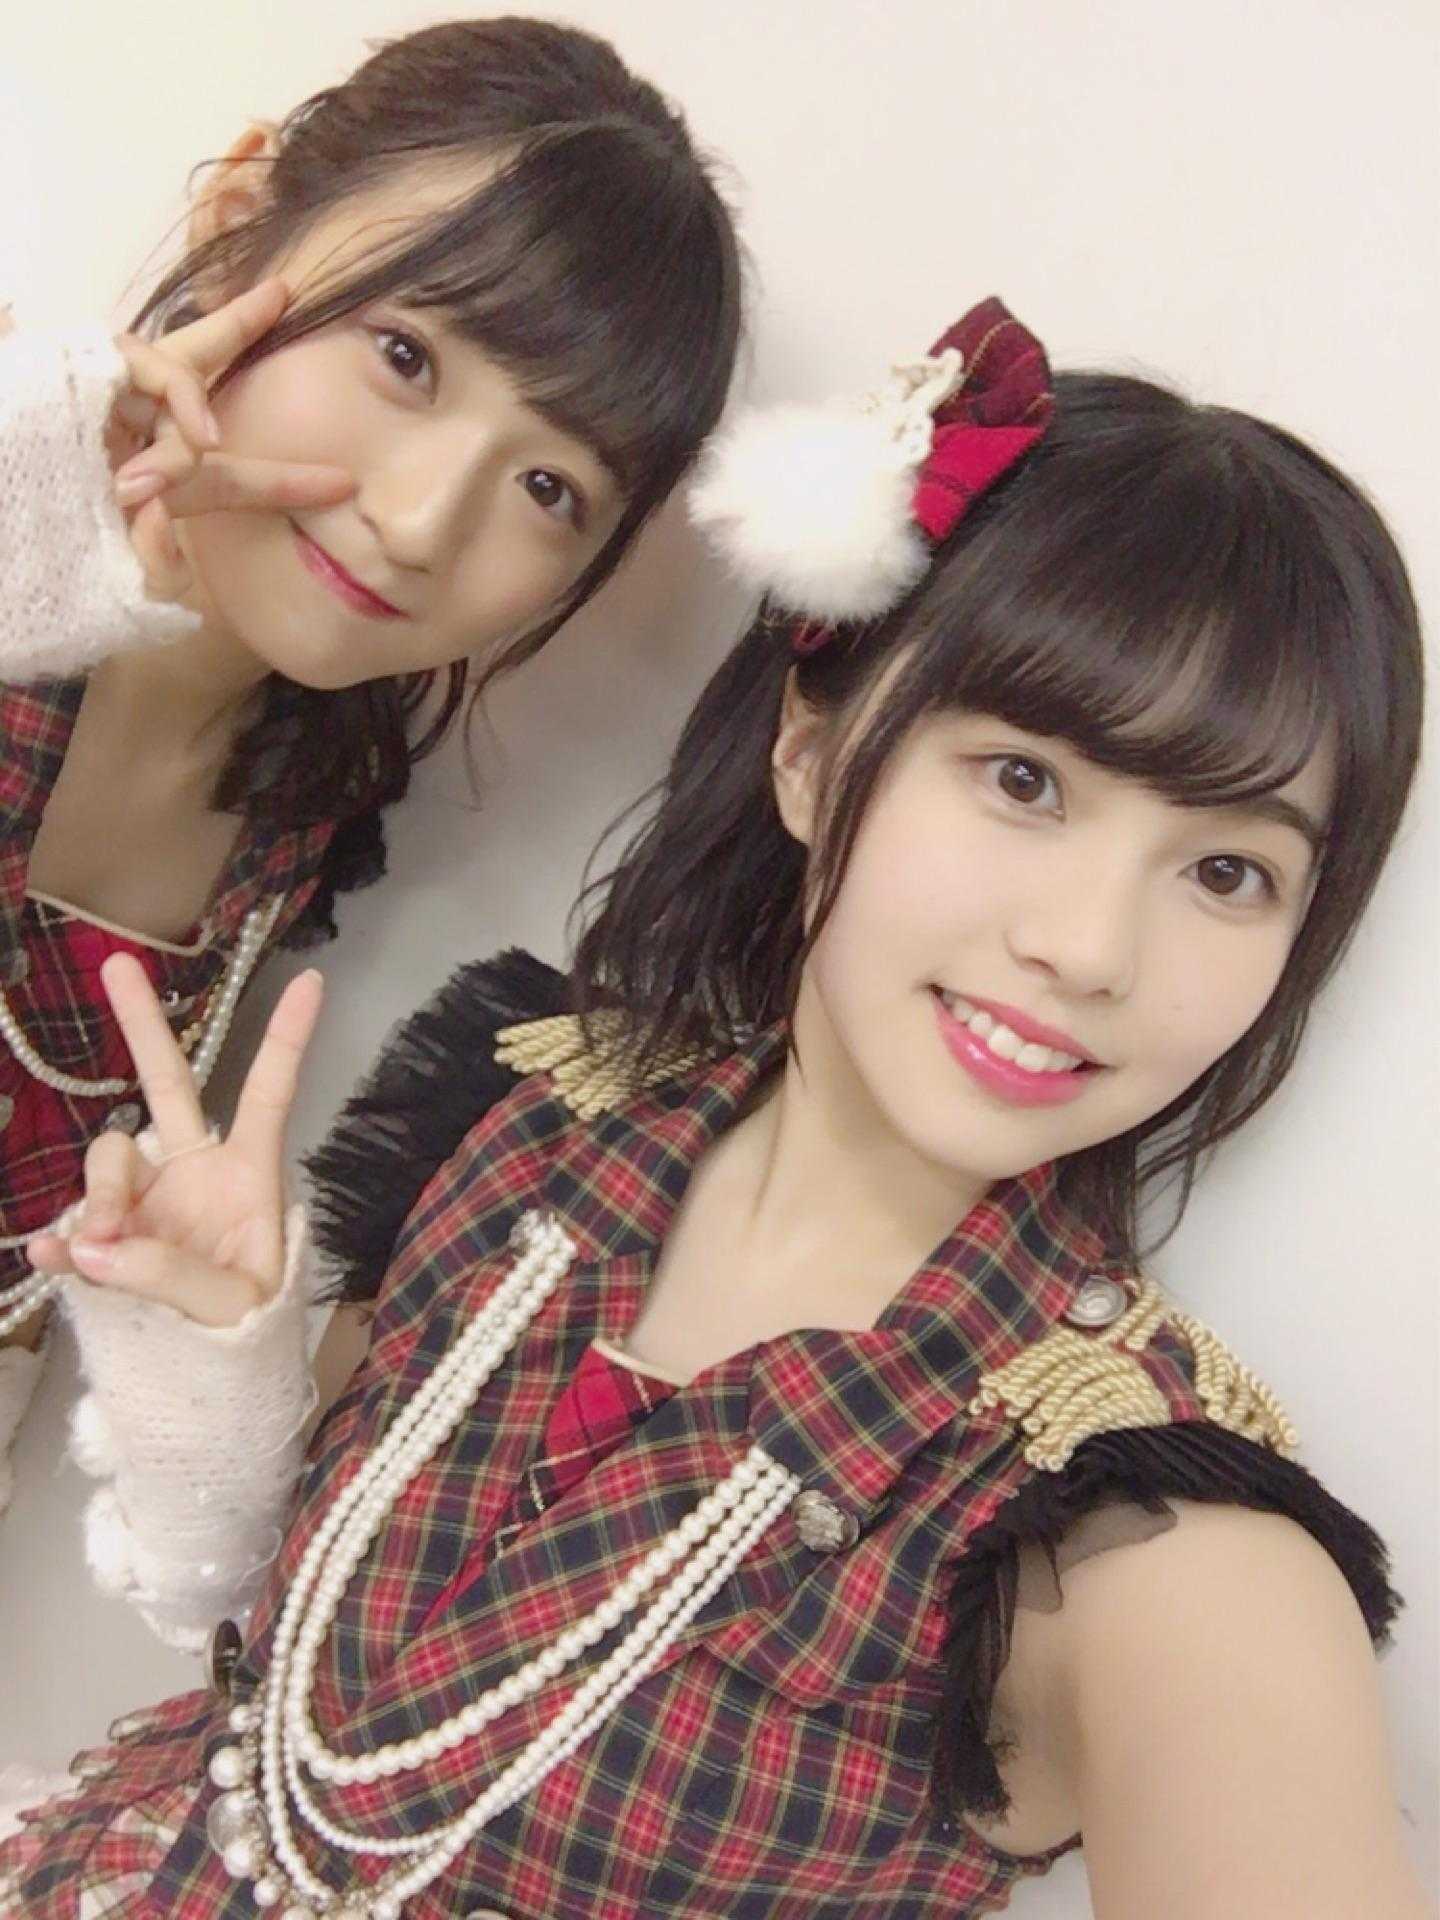 【HKT48】地頭江音々ちゃん応援スレ☆3.2【4期生】 YouTube動画>7本 ->画像>451枚